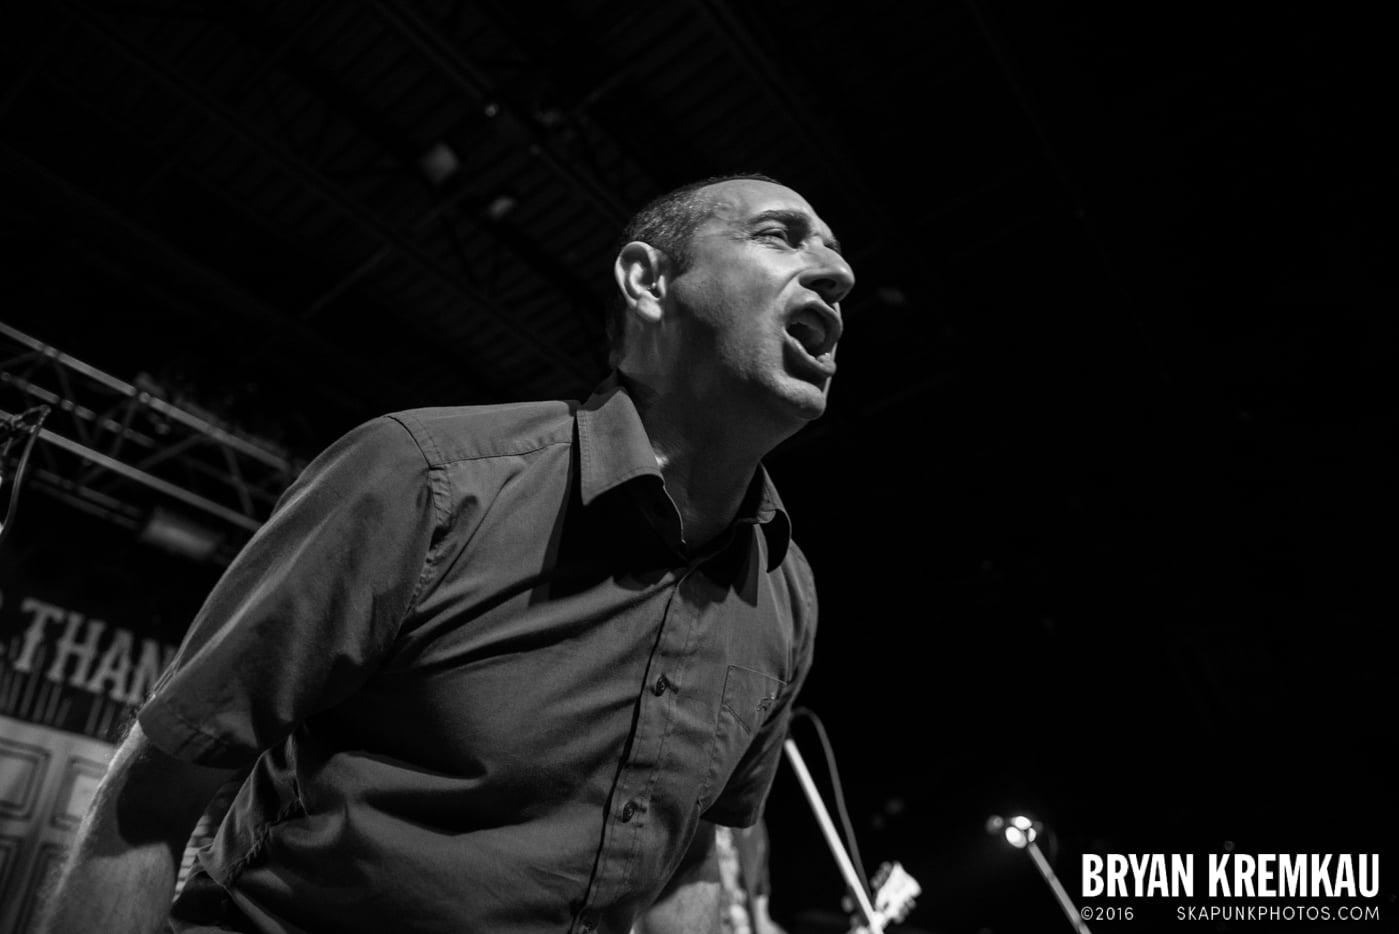 Less Than Jake @ Starland Ballroom, Sayreville, NJ - 11.9.13 (19)